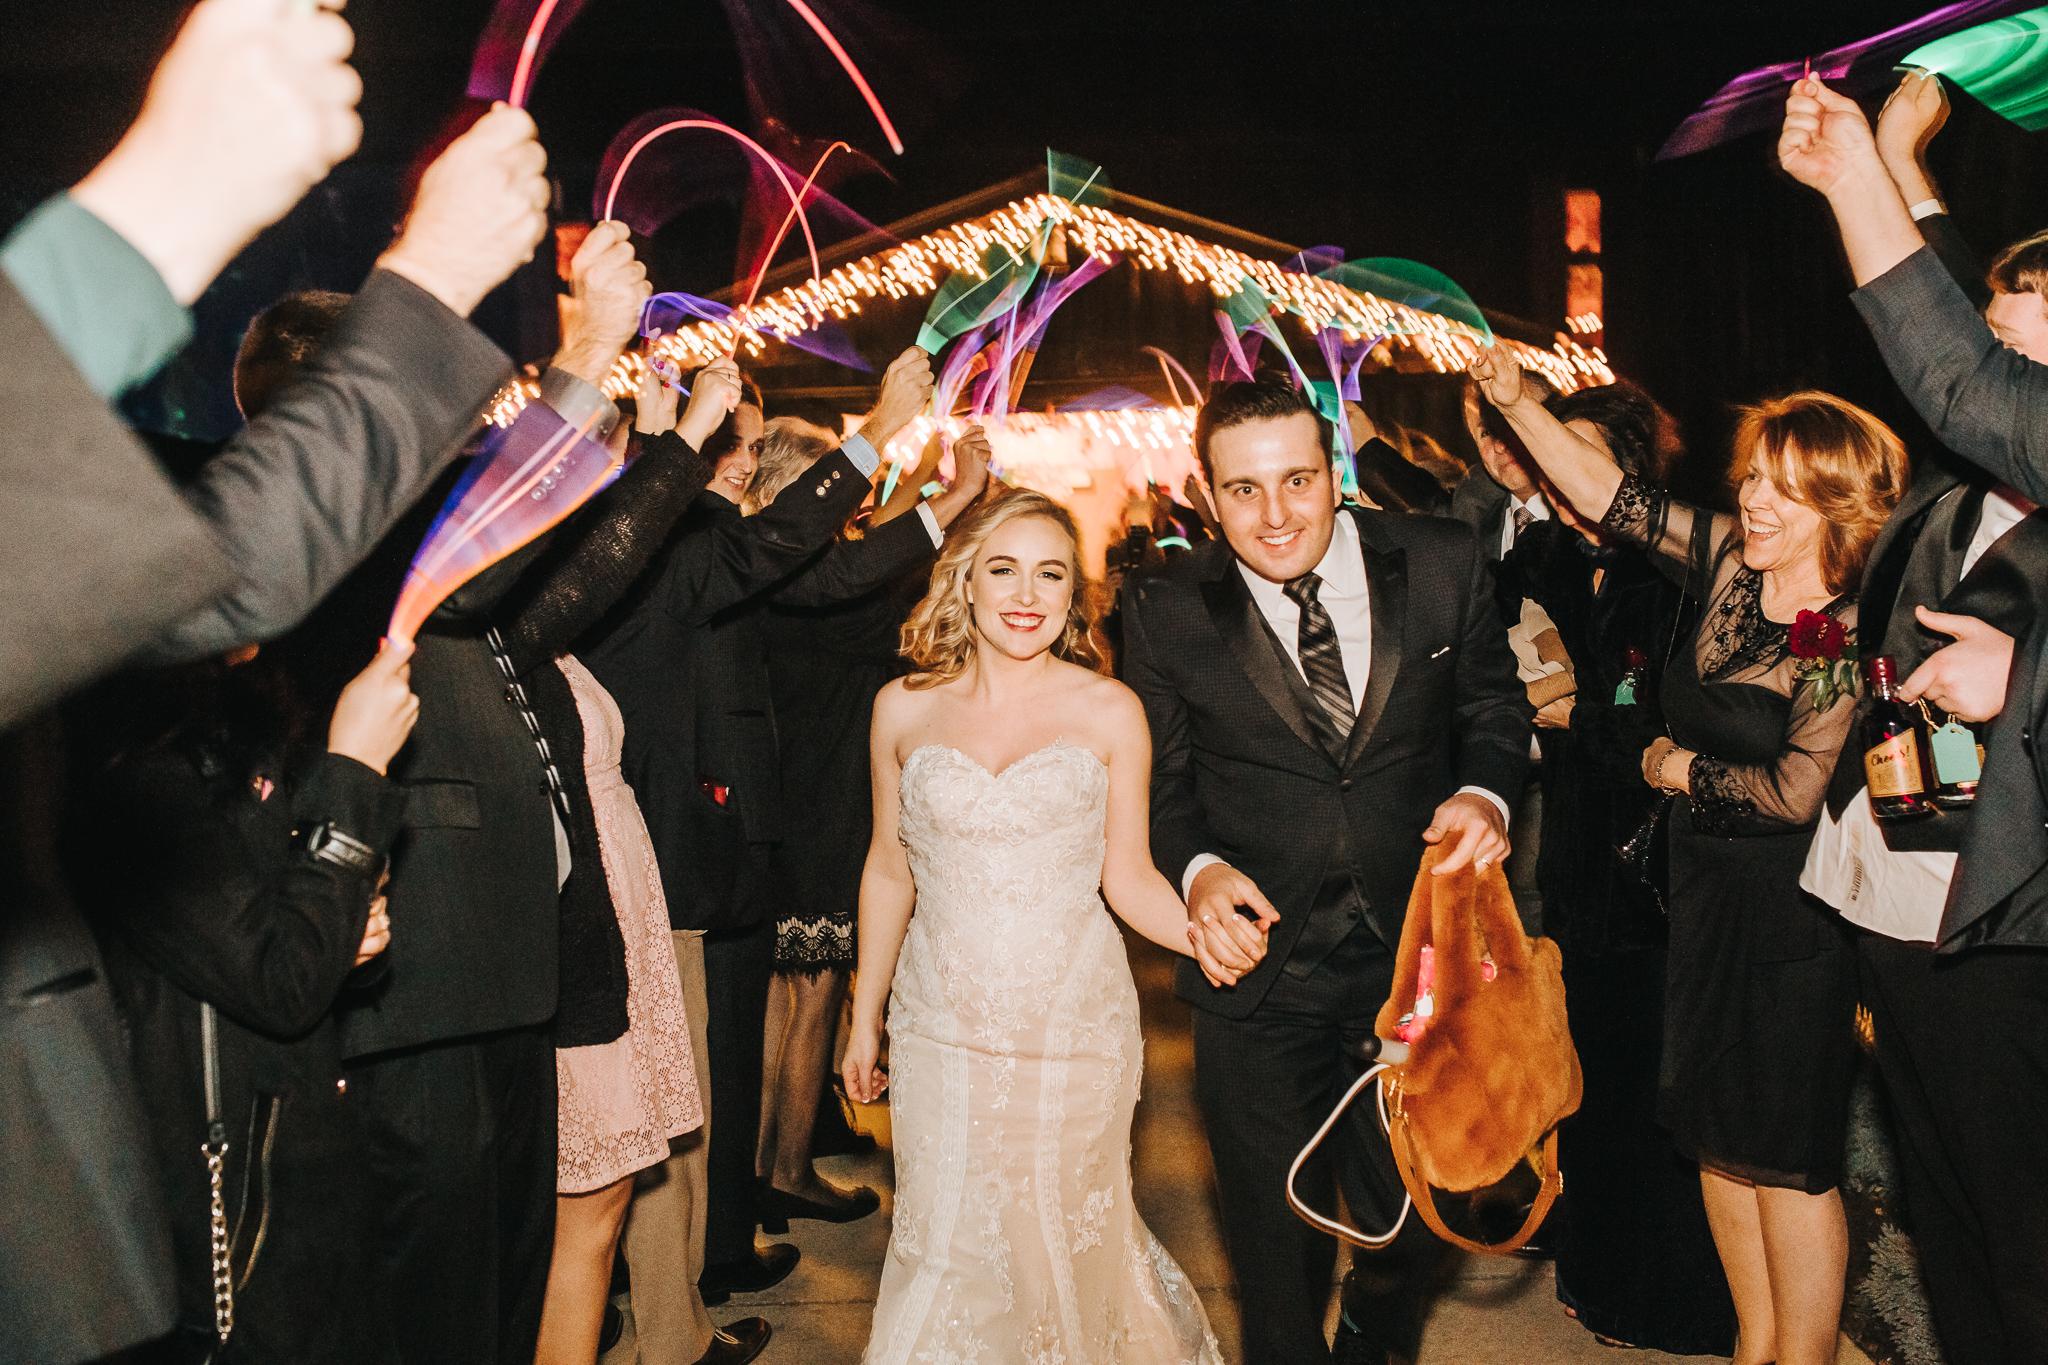 0191 Ariana Jordan Photo - Cameron & Lauren's Wedding at Talon Winery  8891.jpg